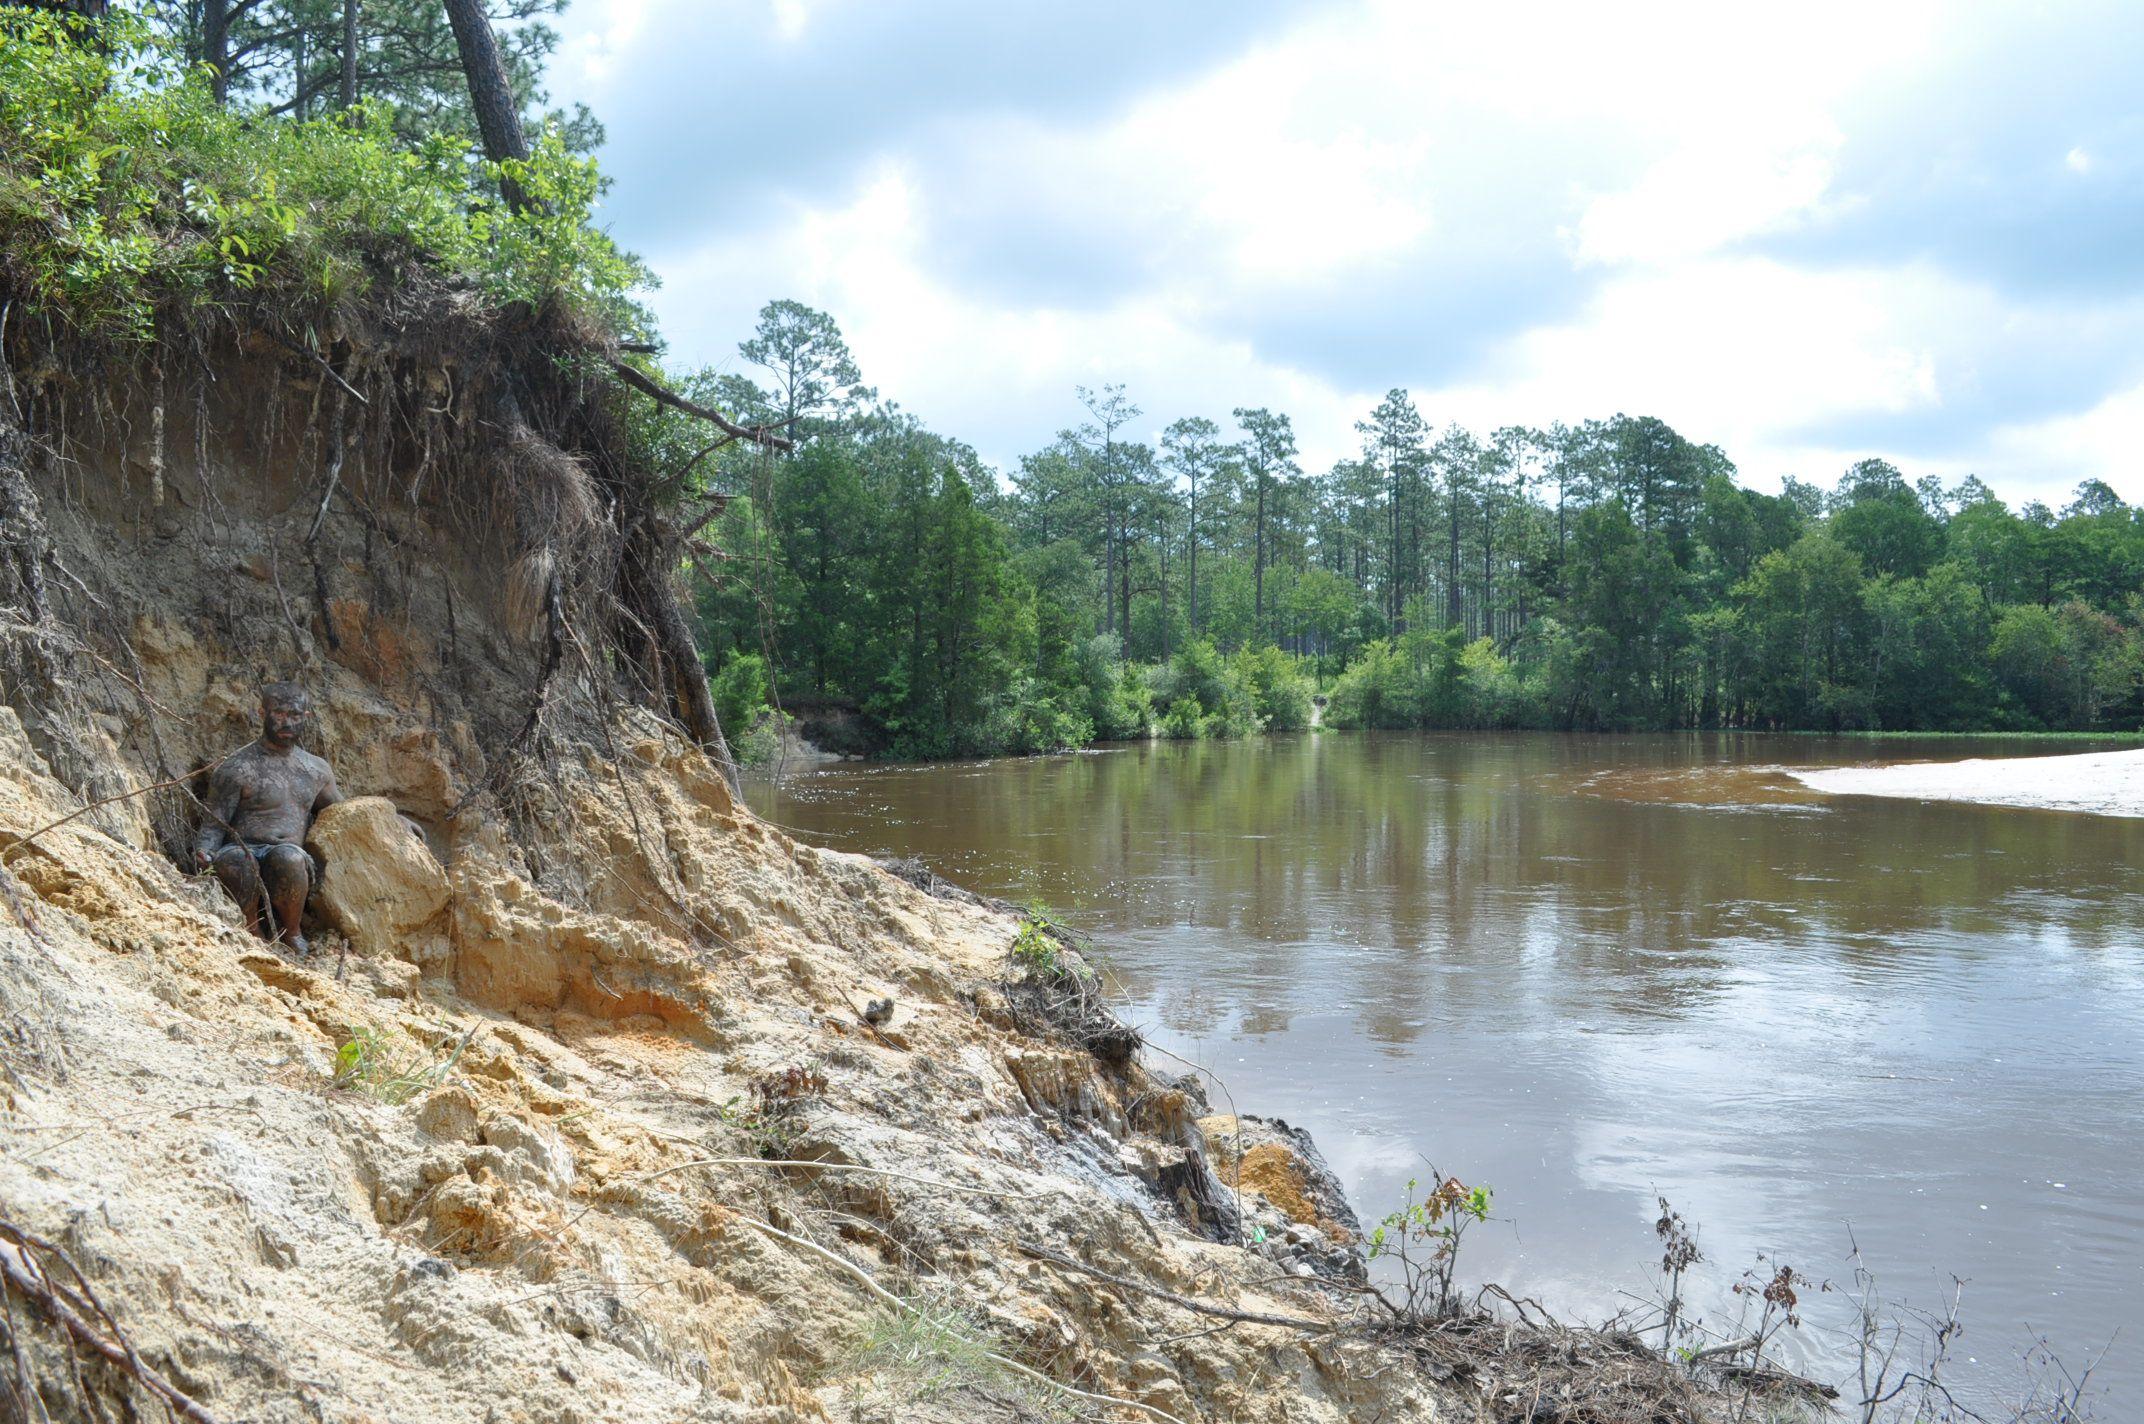 Mud pits off Black Water